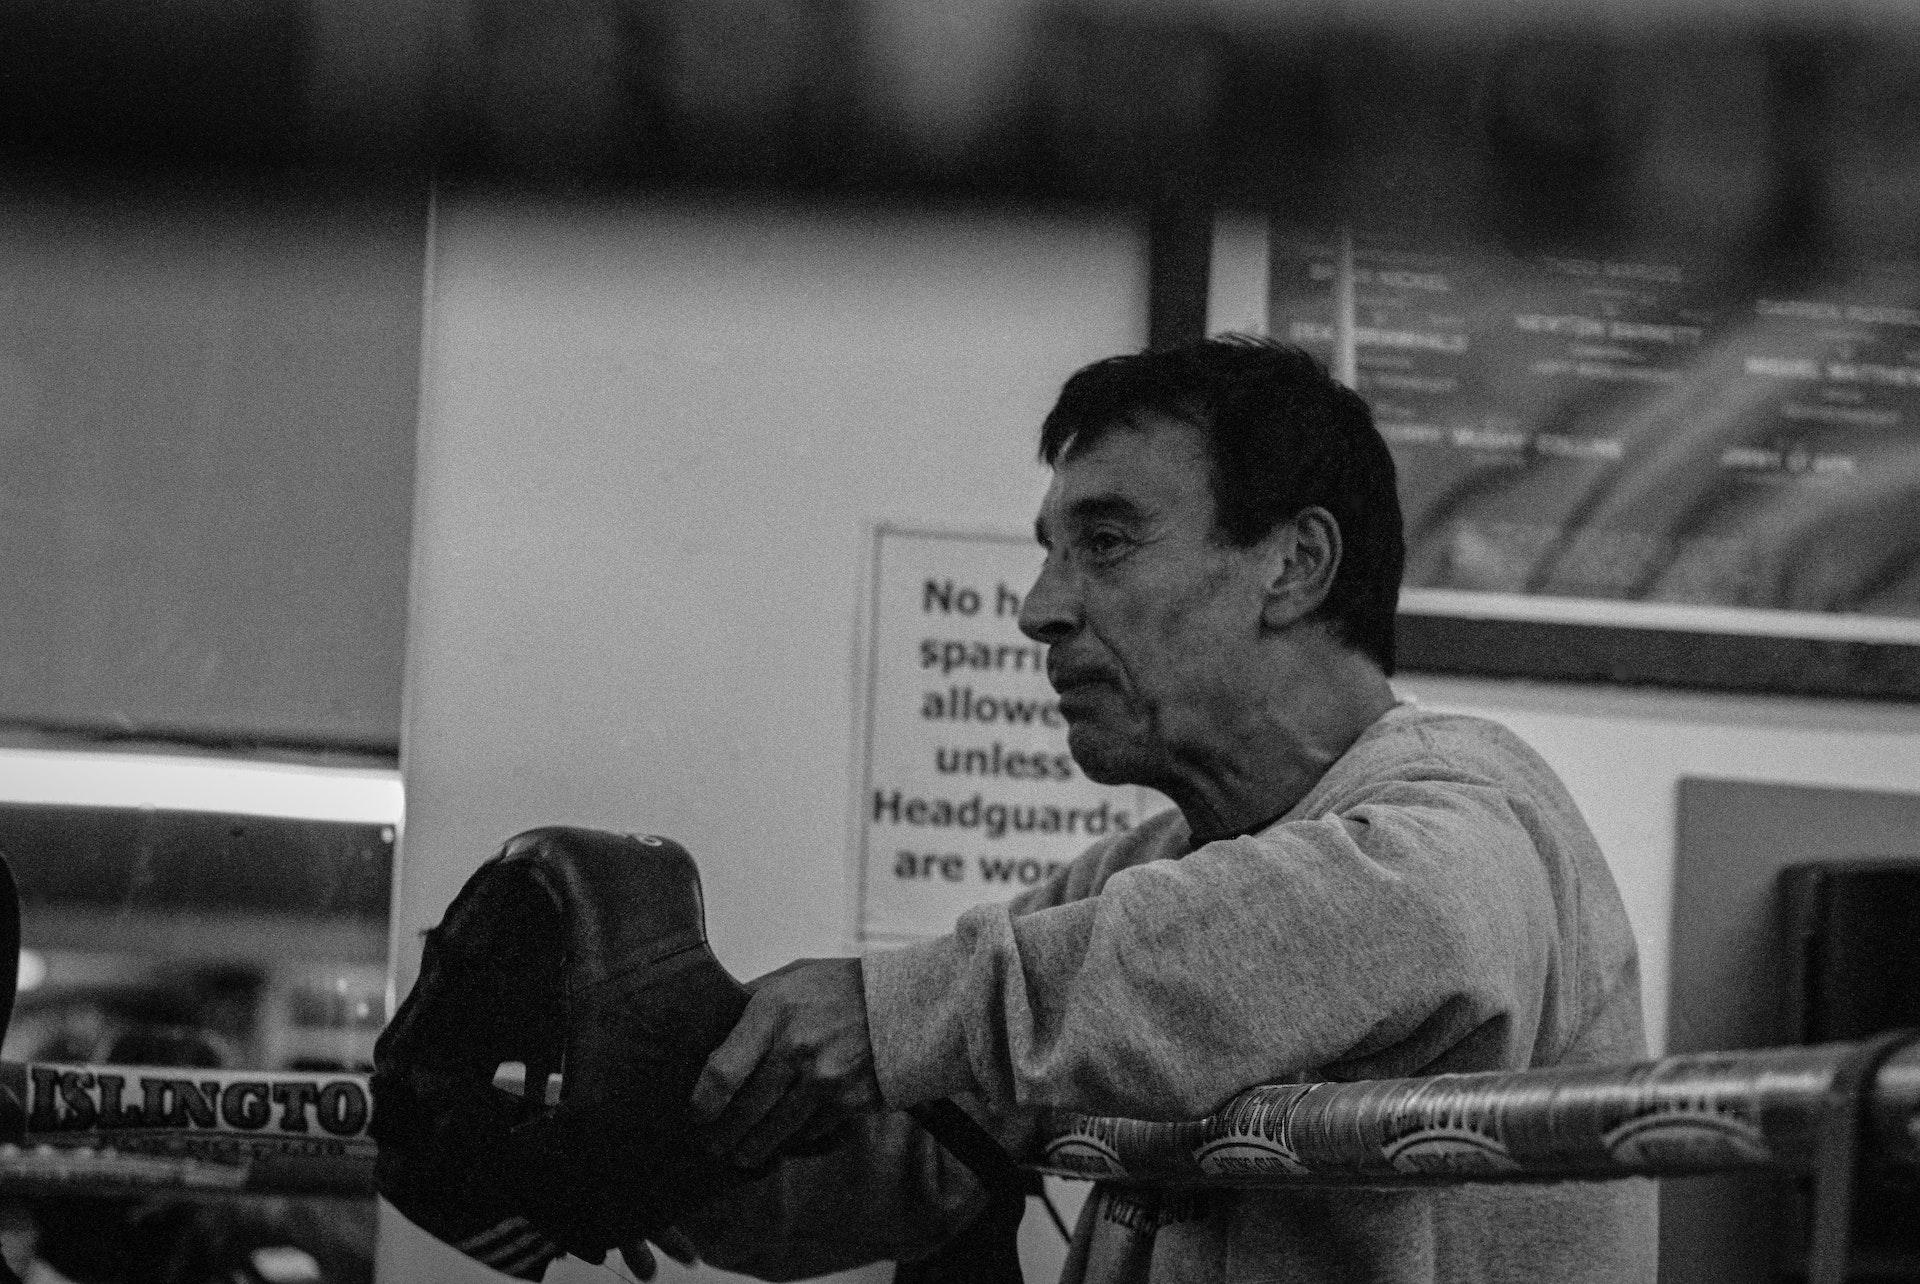 Islington_Boxing_Club-15